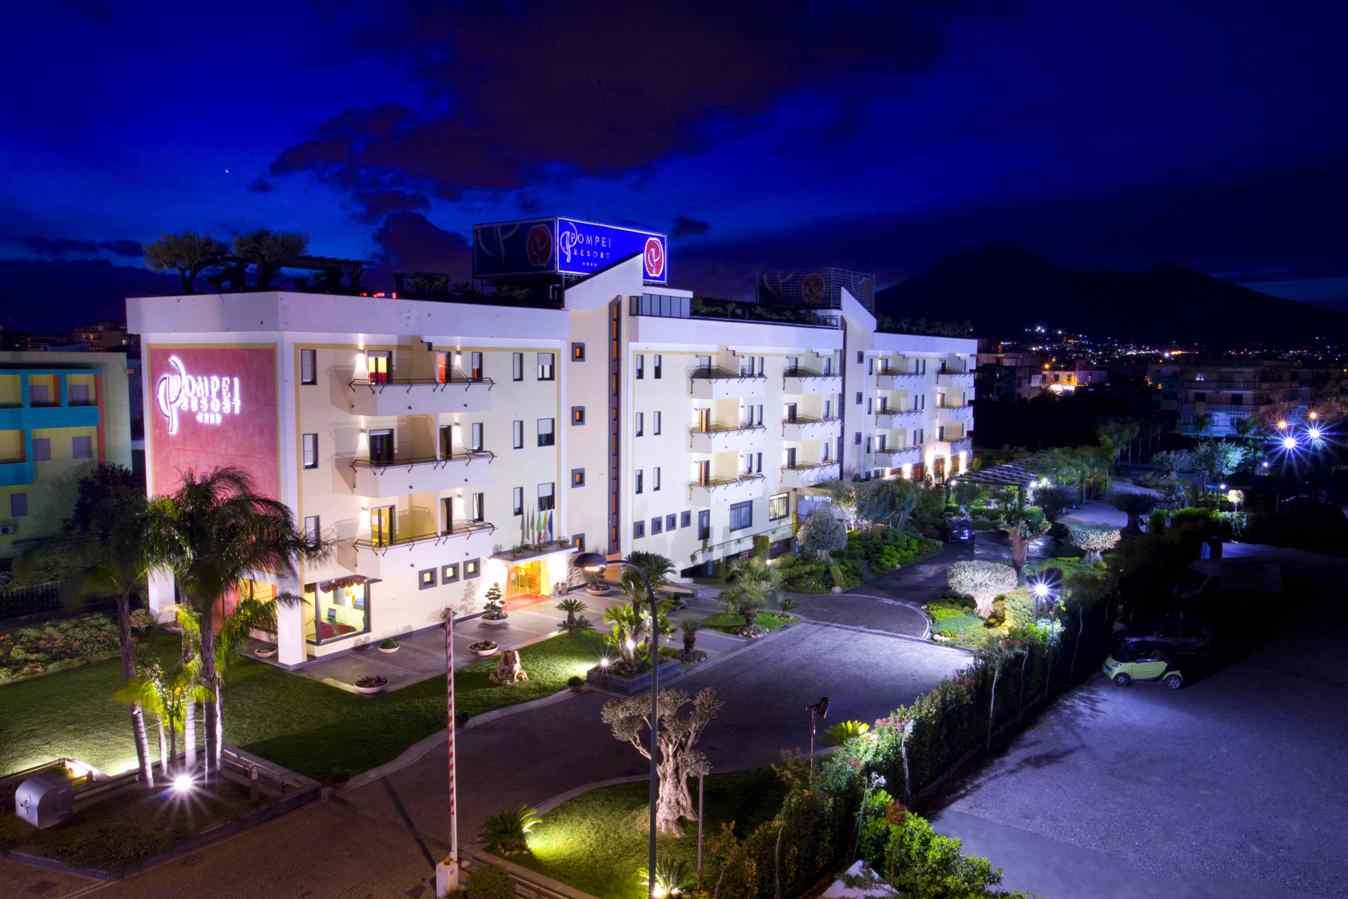 Hotel Autostrada Napoli